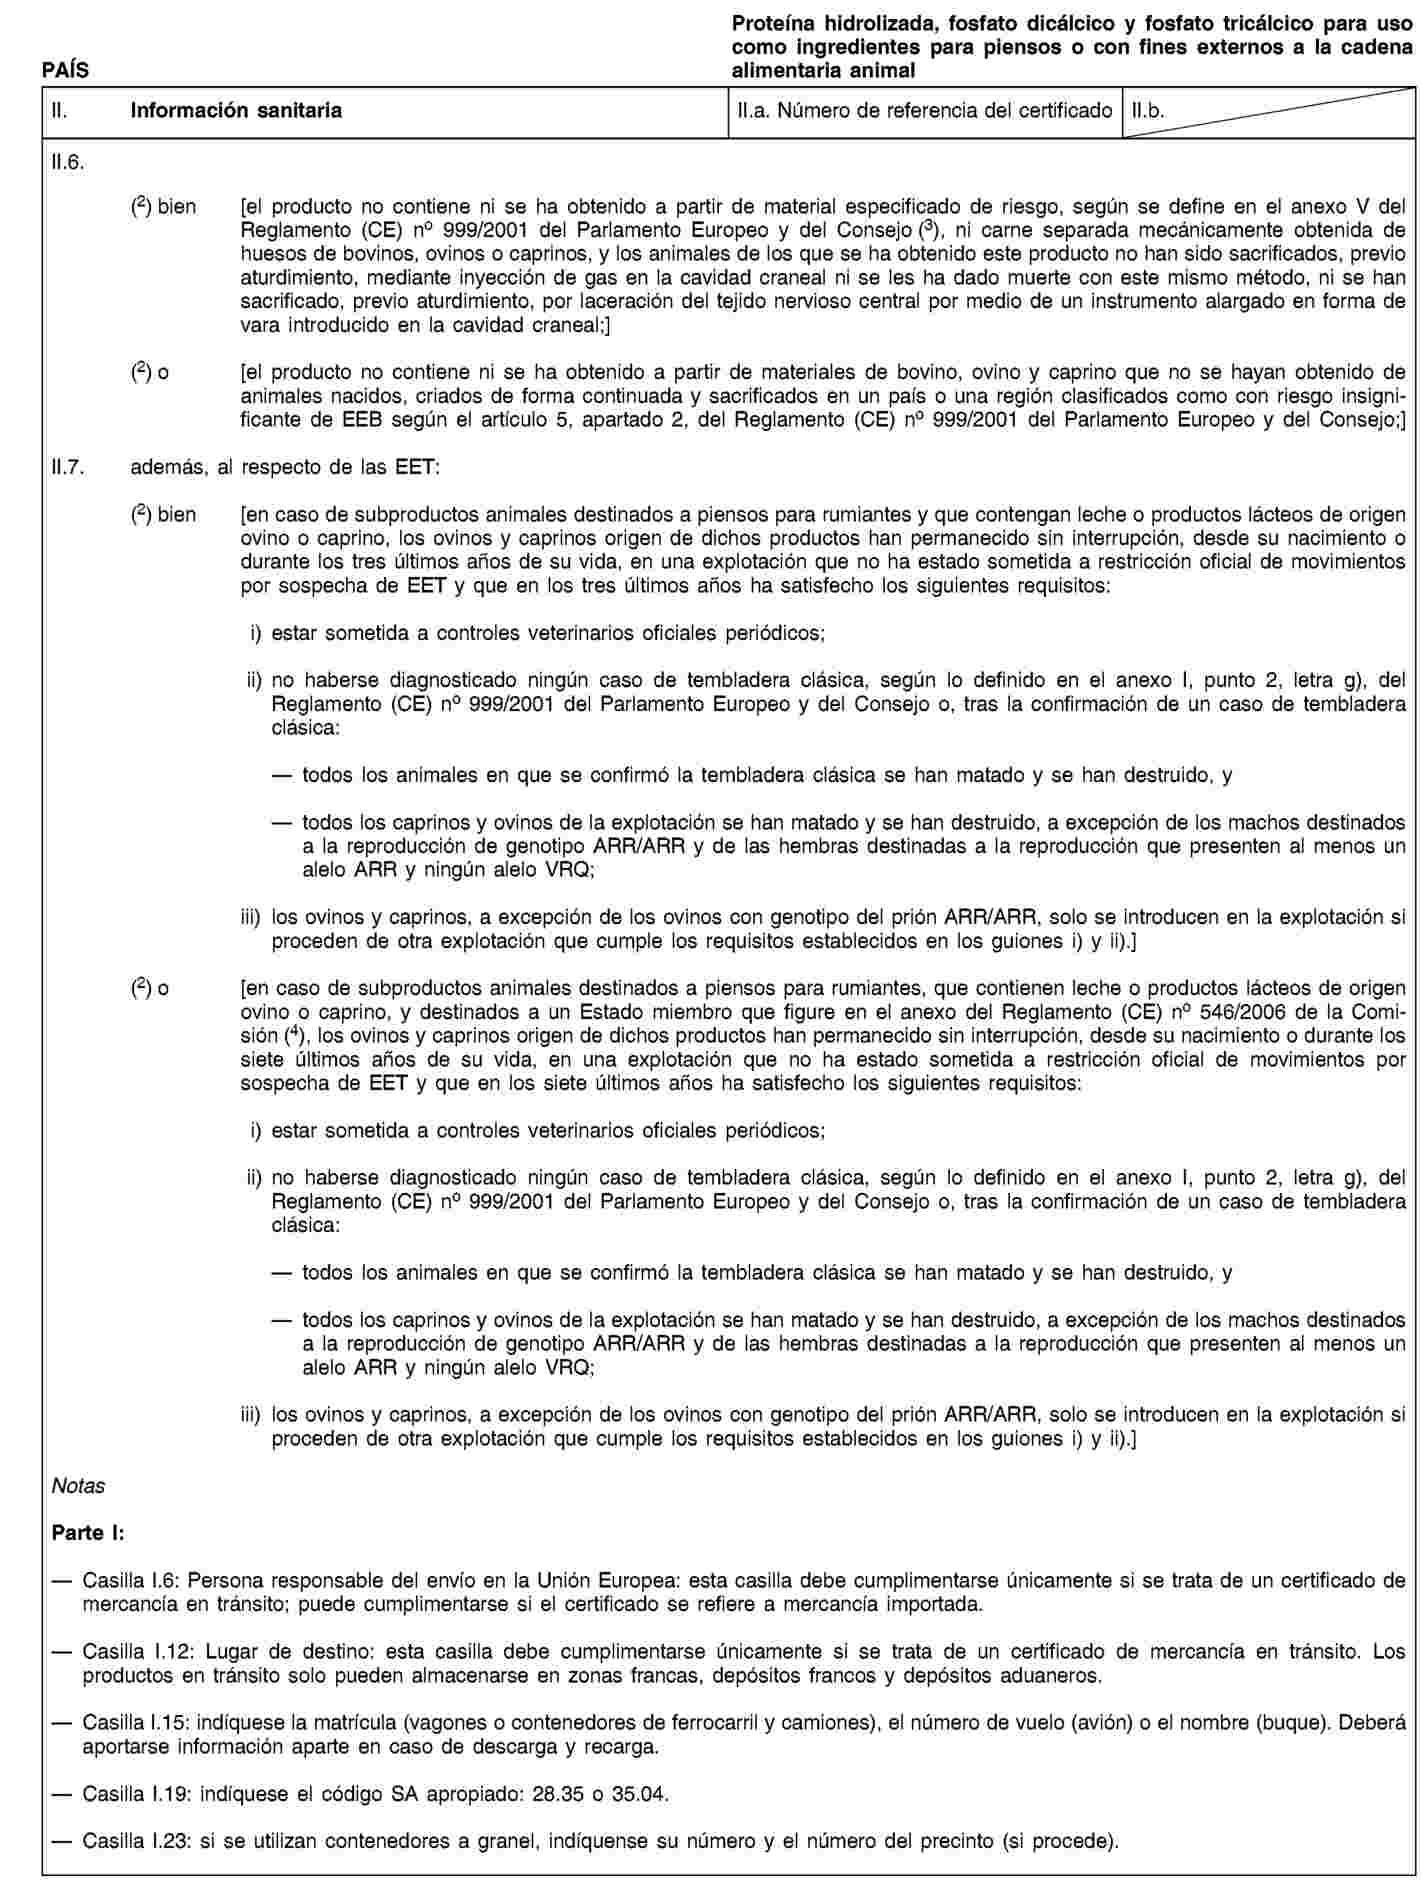 Imagen: https://eur-lex.europa.eu/resource.html?uri=uriserv:OJ.L_.2011.054.01.0001.01.SPA.xhtml.L_2011054ES.01022101.tif.jpg